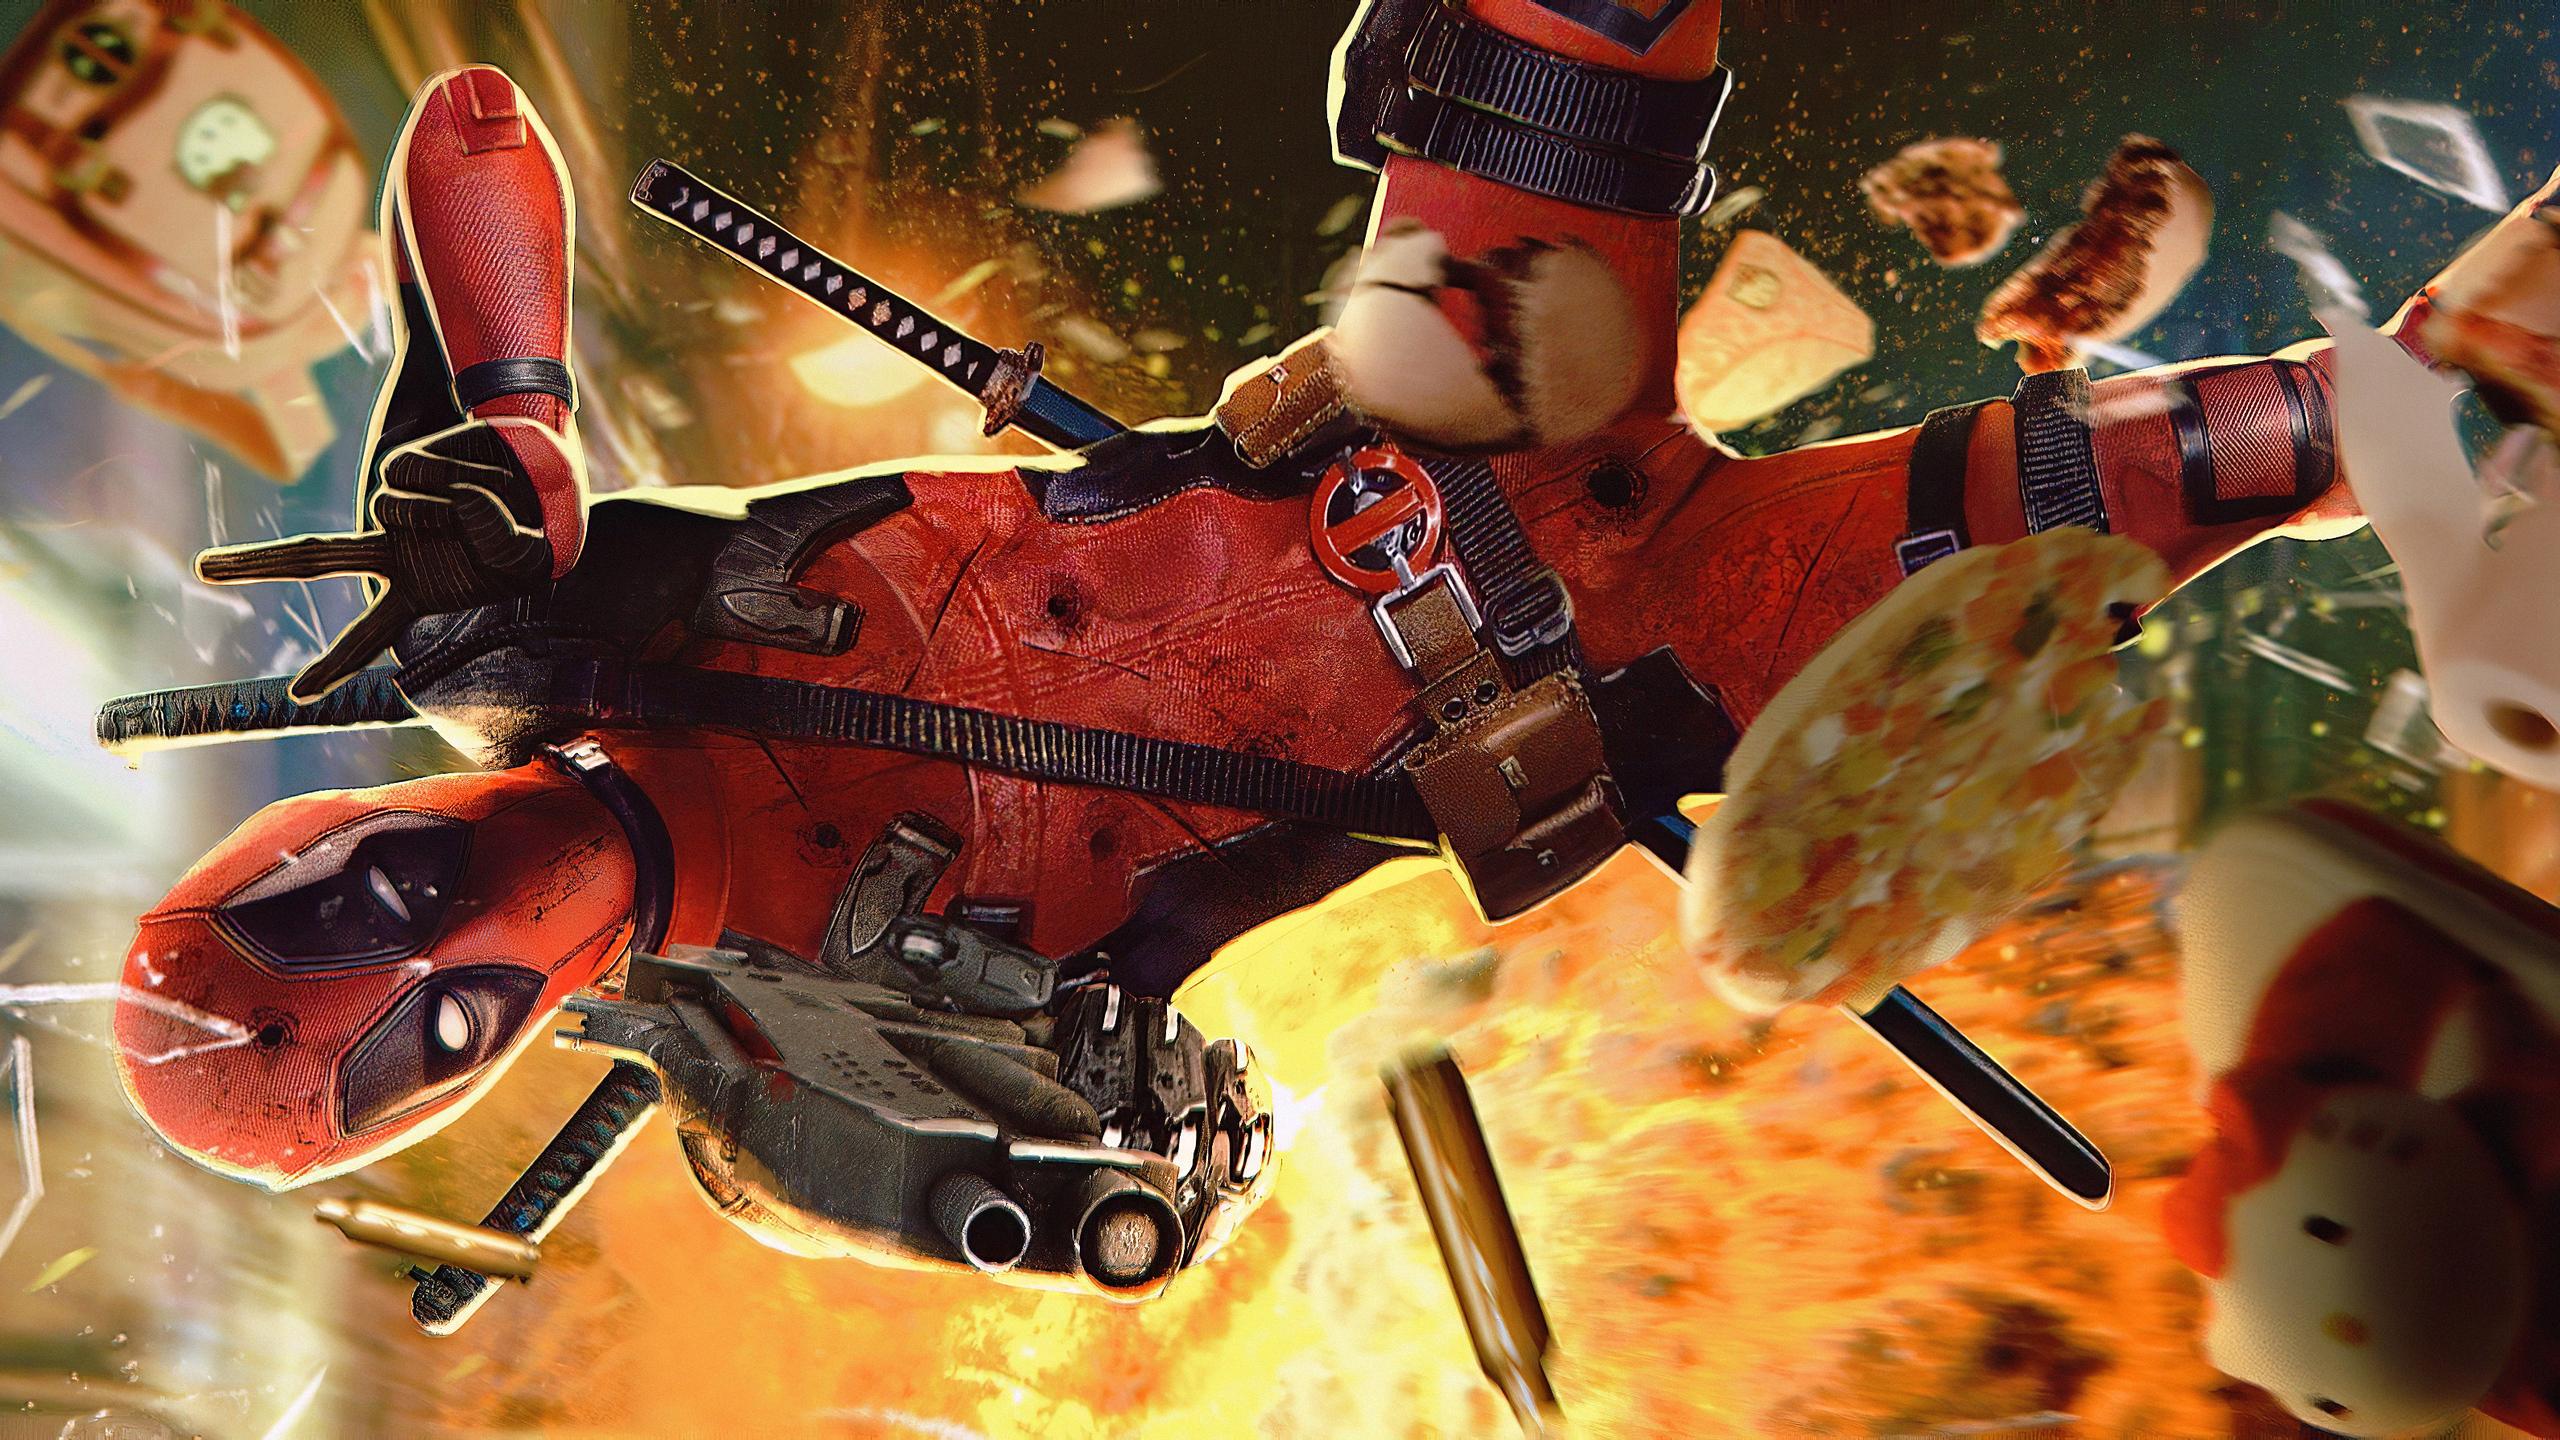 2560x1440 Deadpool Fire 1440p Resolution Hd 4k Wallpapers